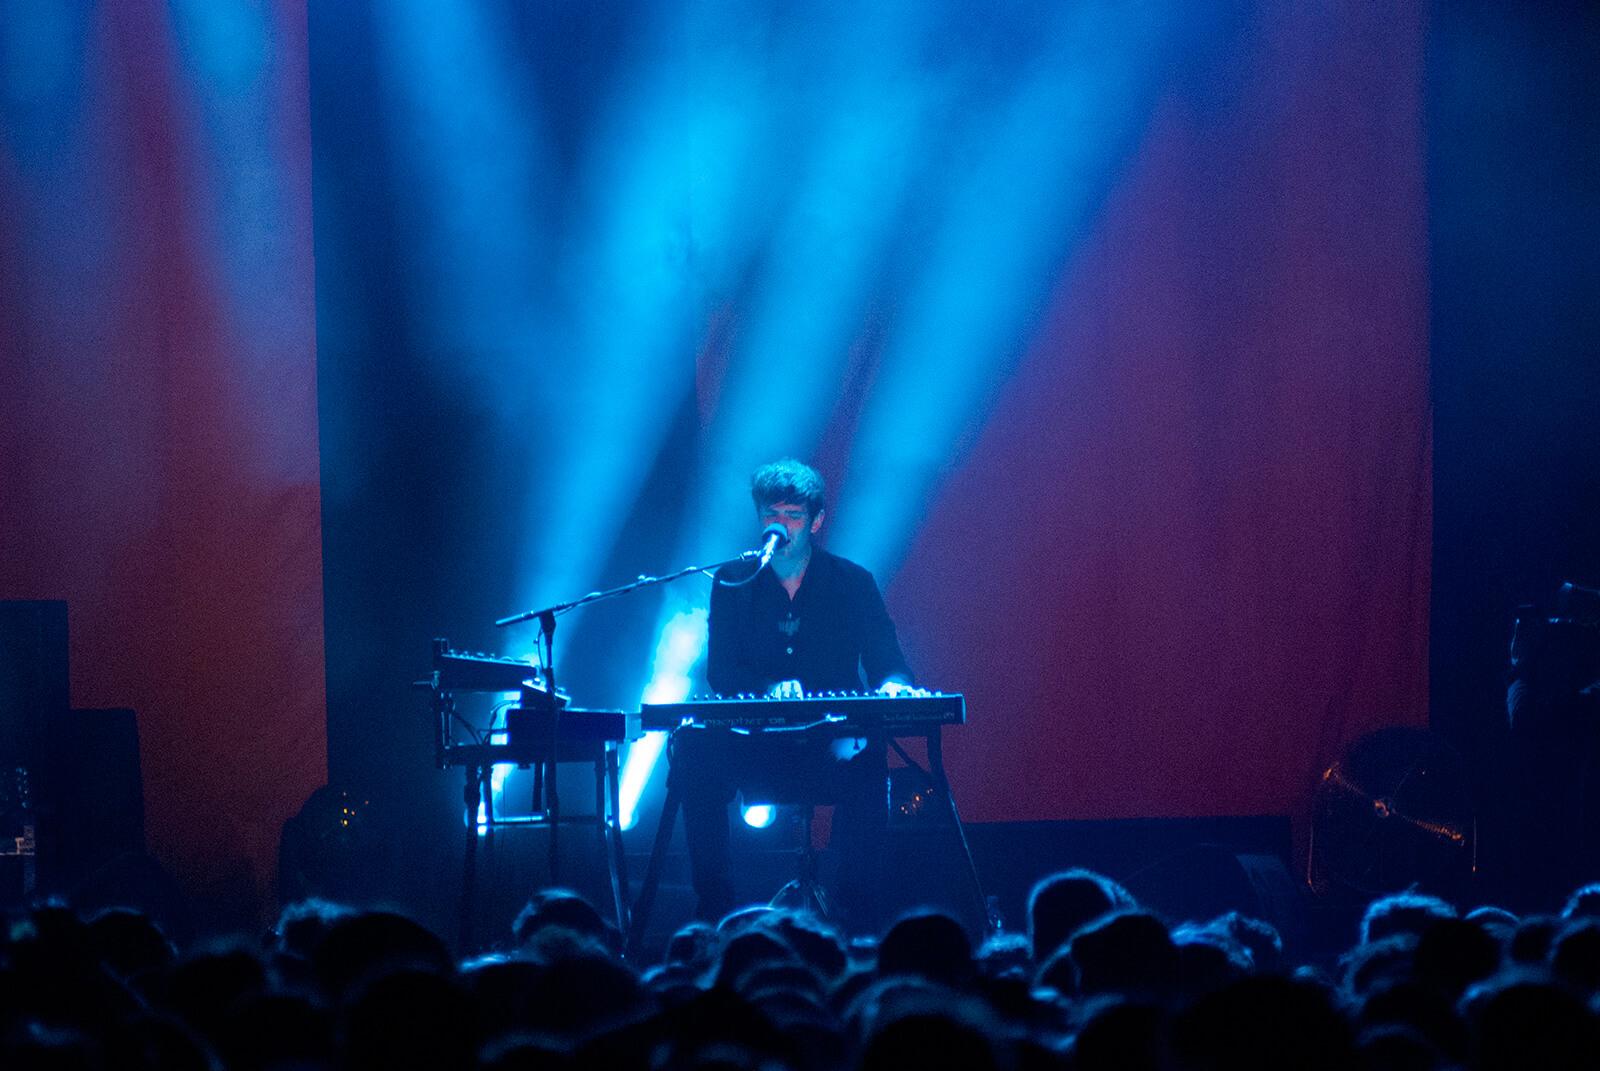 BERLIN FESTIVAL 2015 06